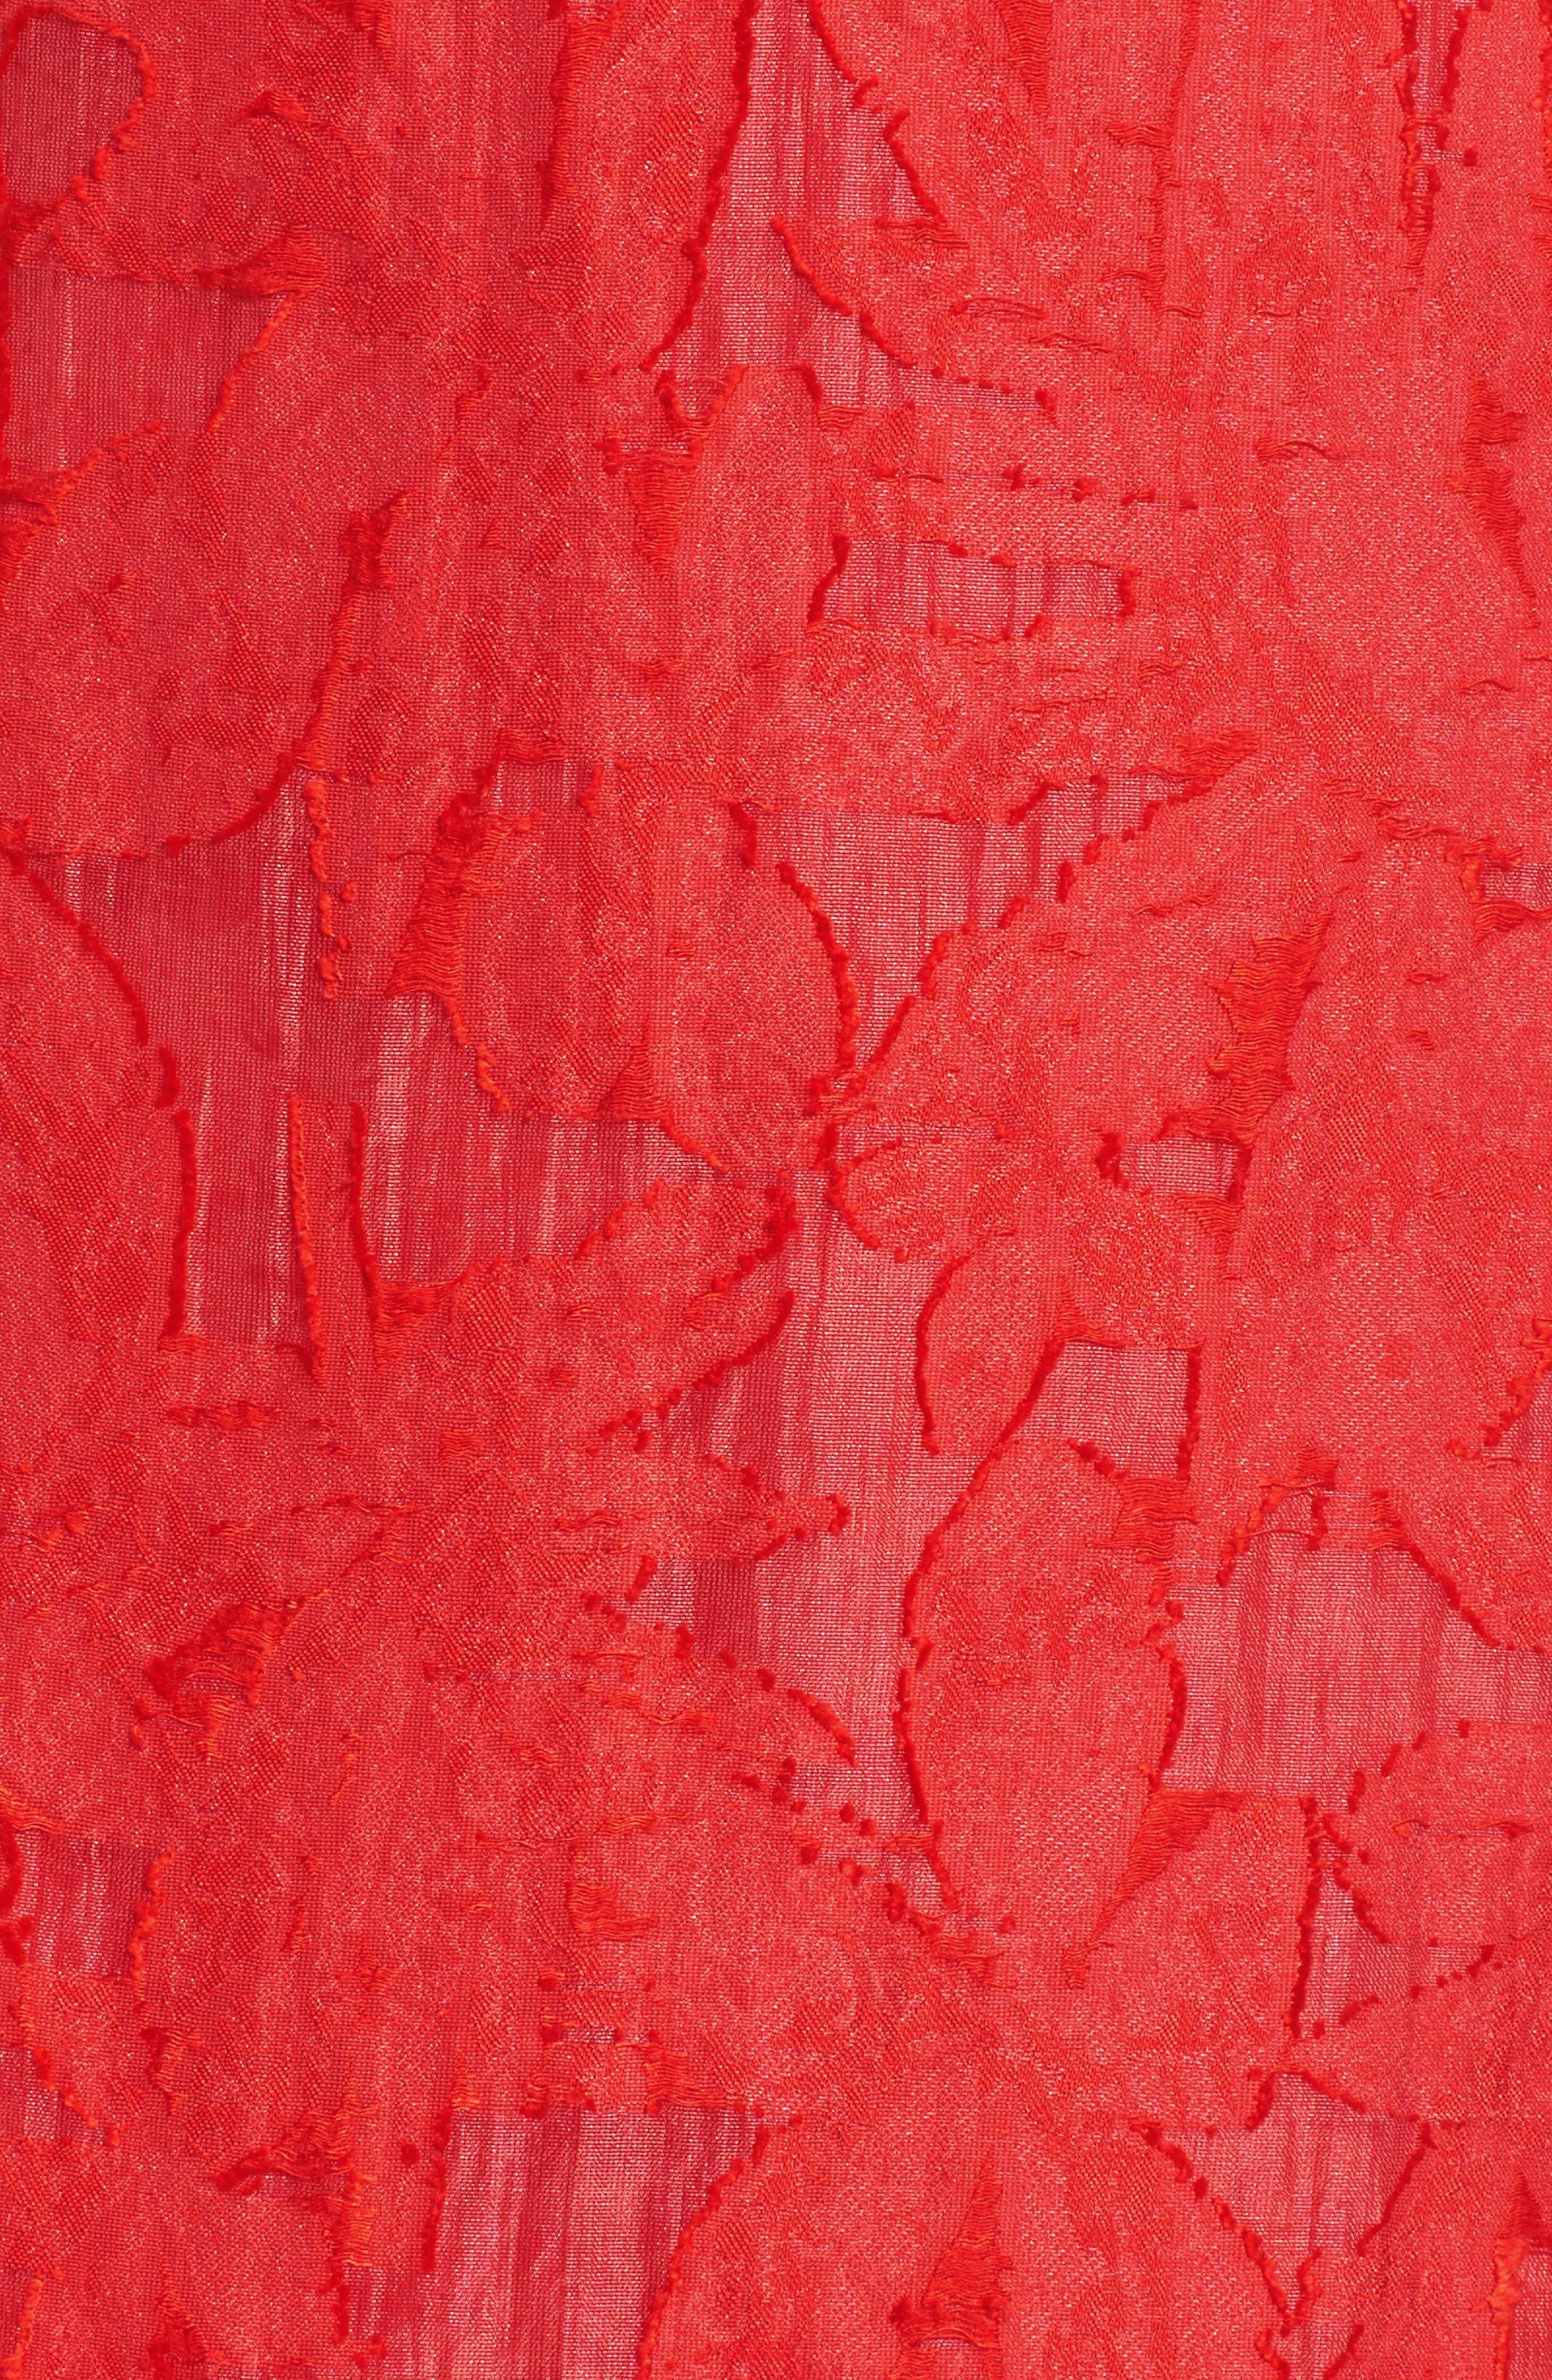 Organza Ruffle Sheath Dress,                             Alternate thumbnail 5, color,                             Red